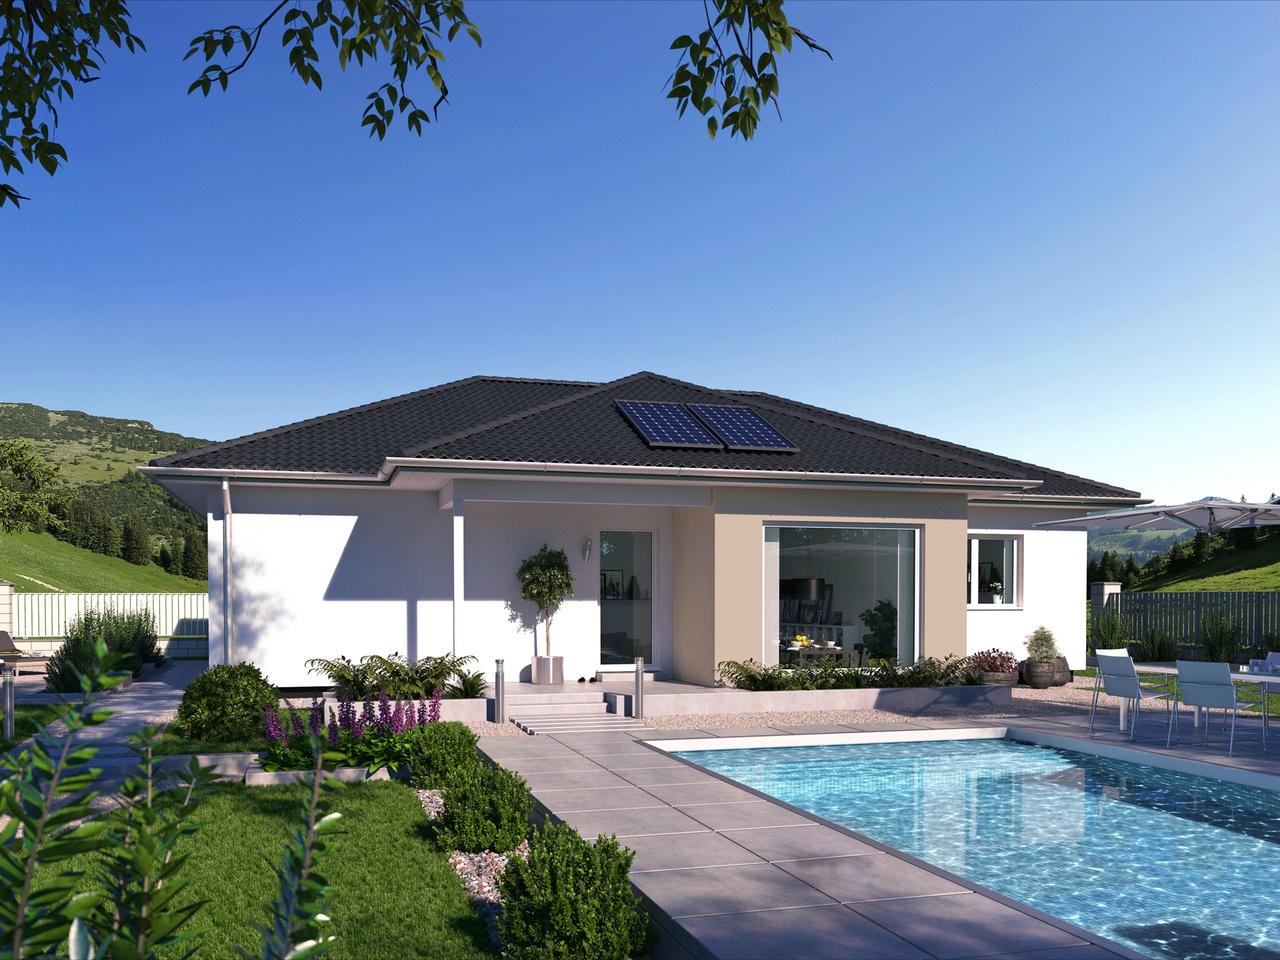 bungalow sh 113 b variante a scanhaus marlow. Black Bedroom Furniture Sets. Home Design Ideas